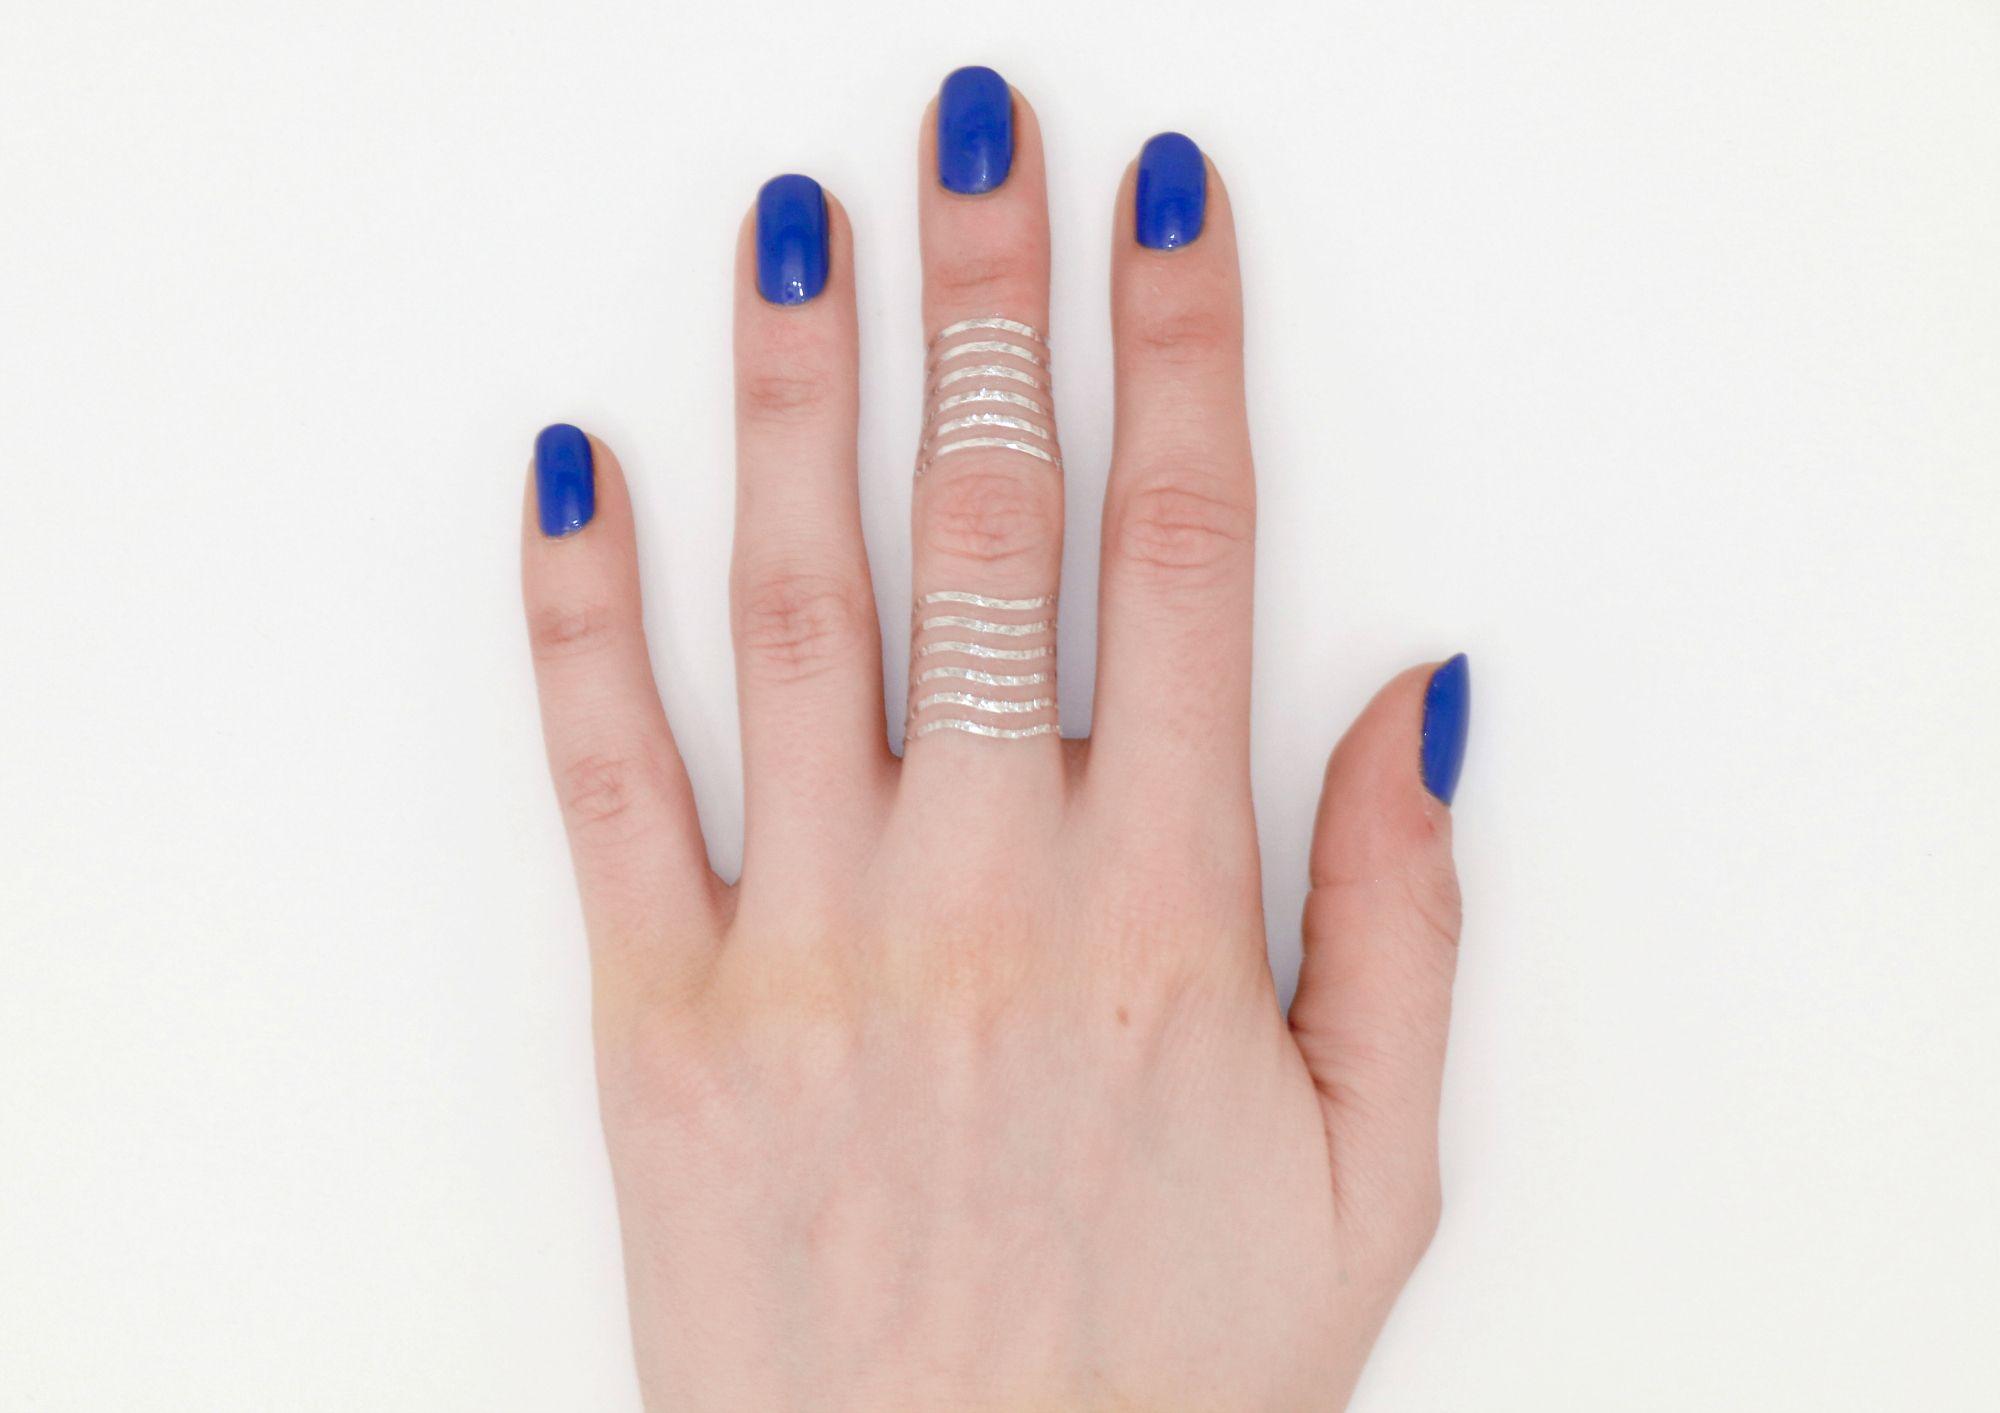 Flash tattoo cage ring!